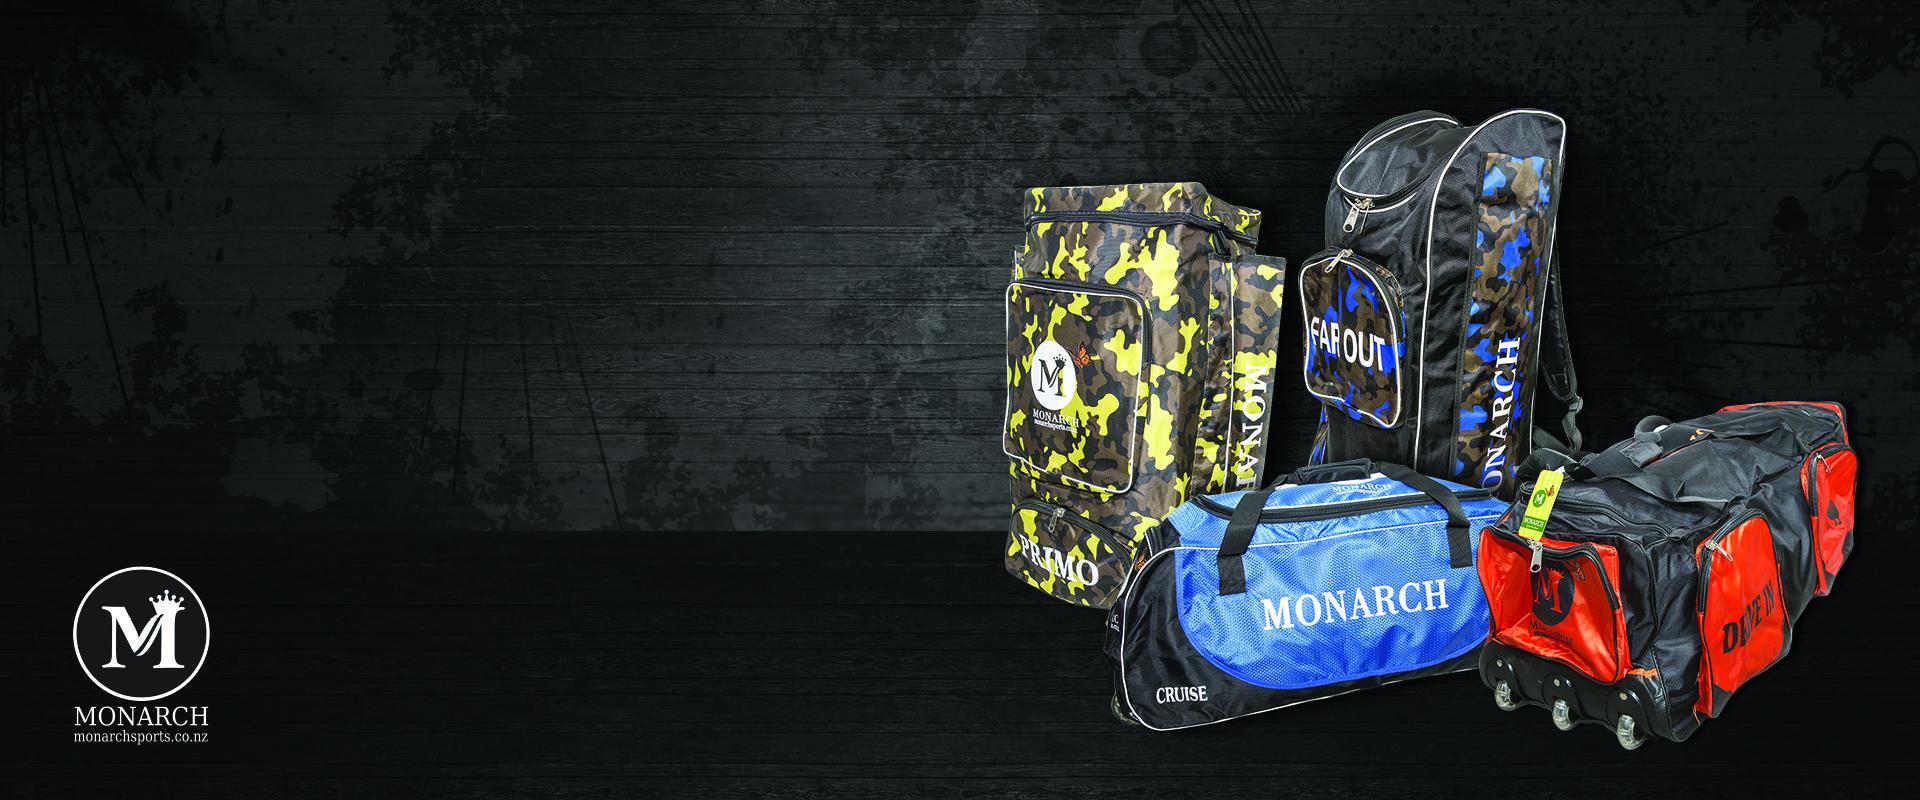 www monarchsports co nz